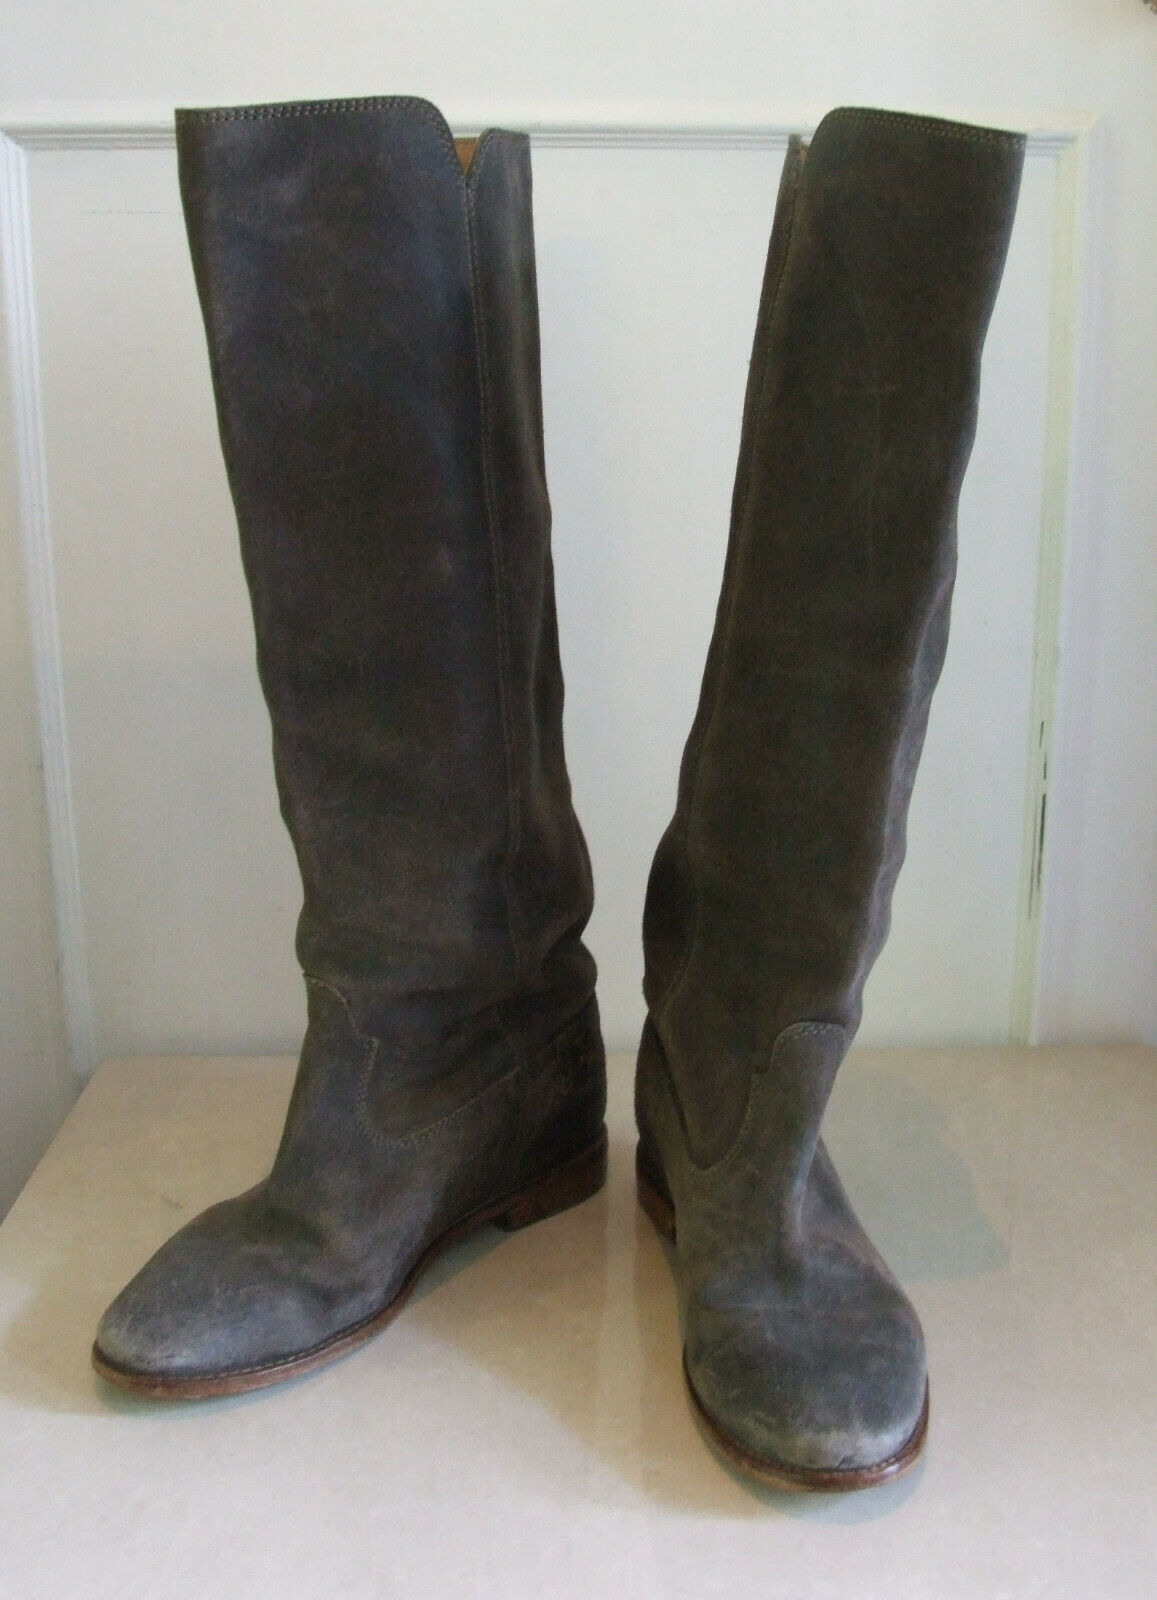 Designer Isabel Marant Fabulous Tall Heavy Duty grau grau grau Leather Stiefel EU 41-UK 7.5 741e29